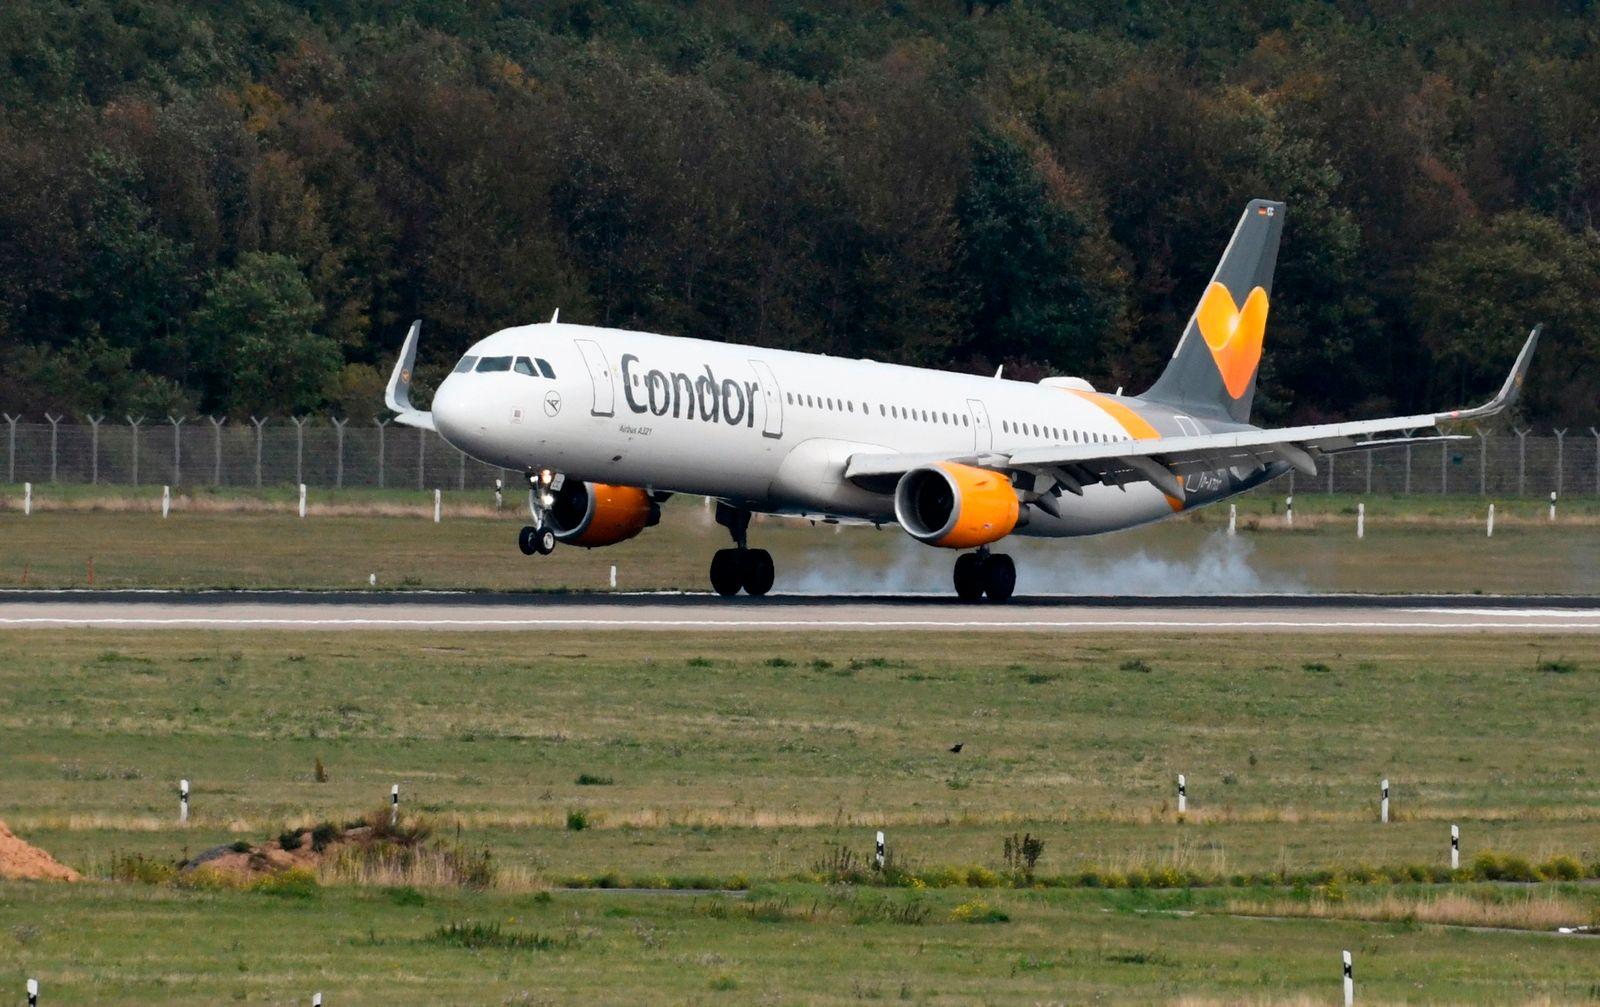 Condor Flugzeug Landung